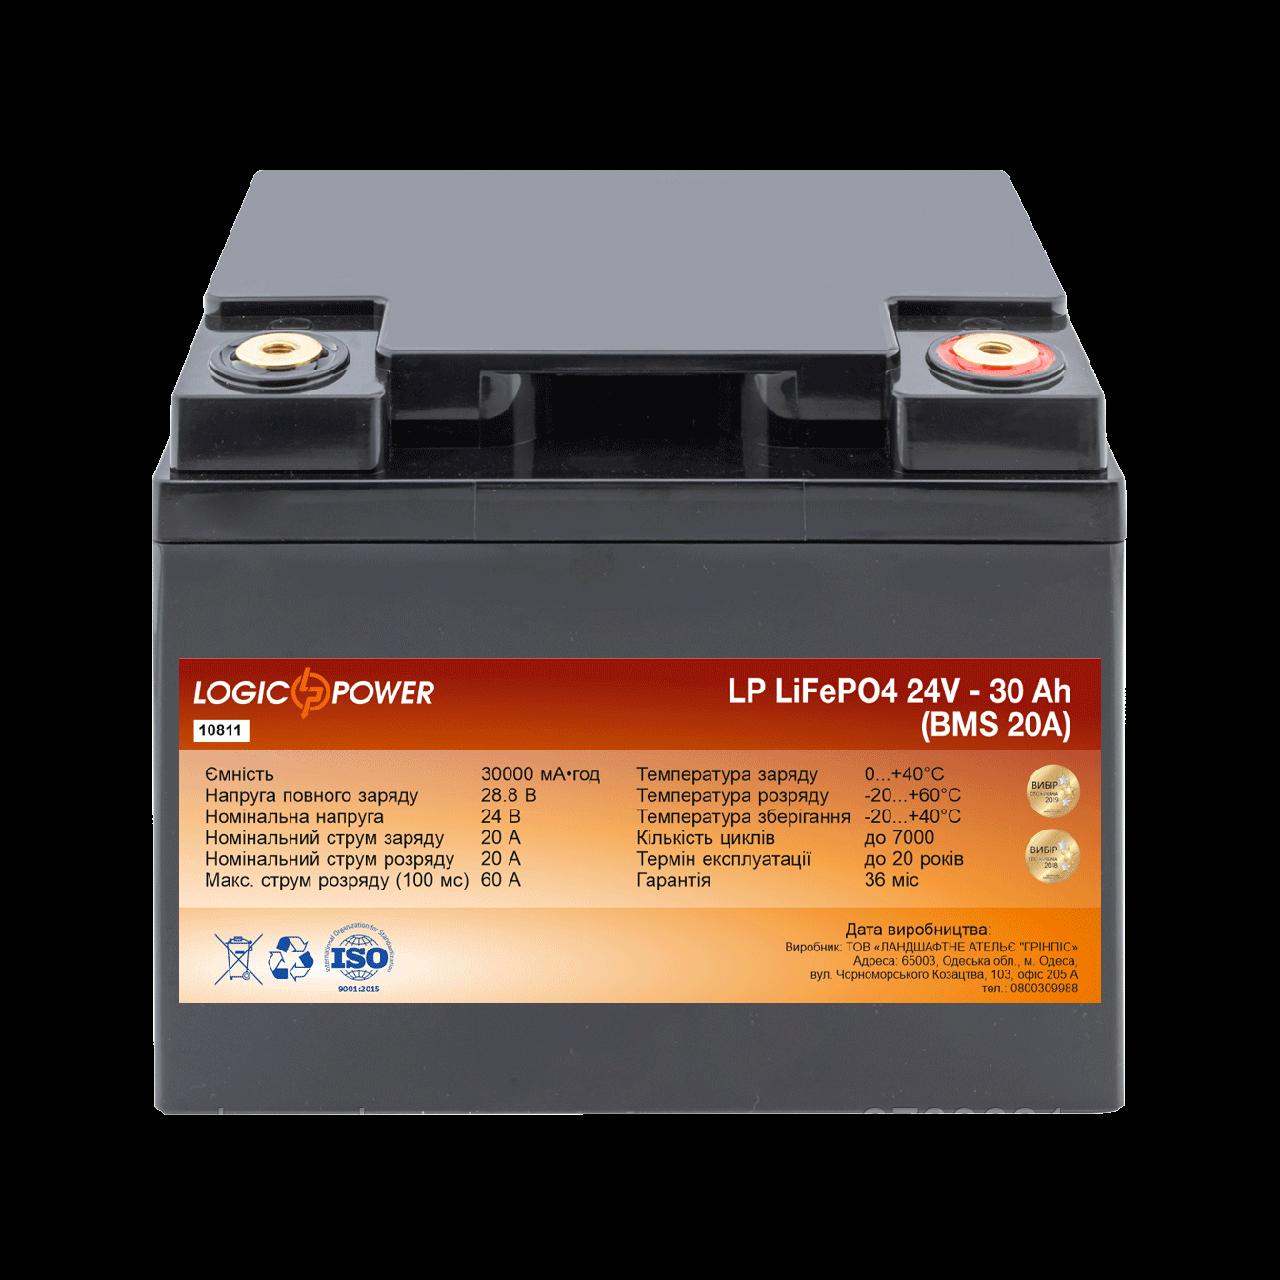 Аккумулятор LP LiFePo-4 24V - 30 Ah (BMS 20A) пластик